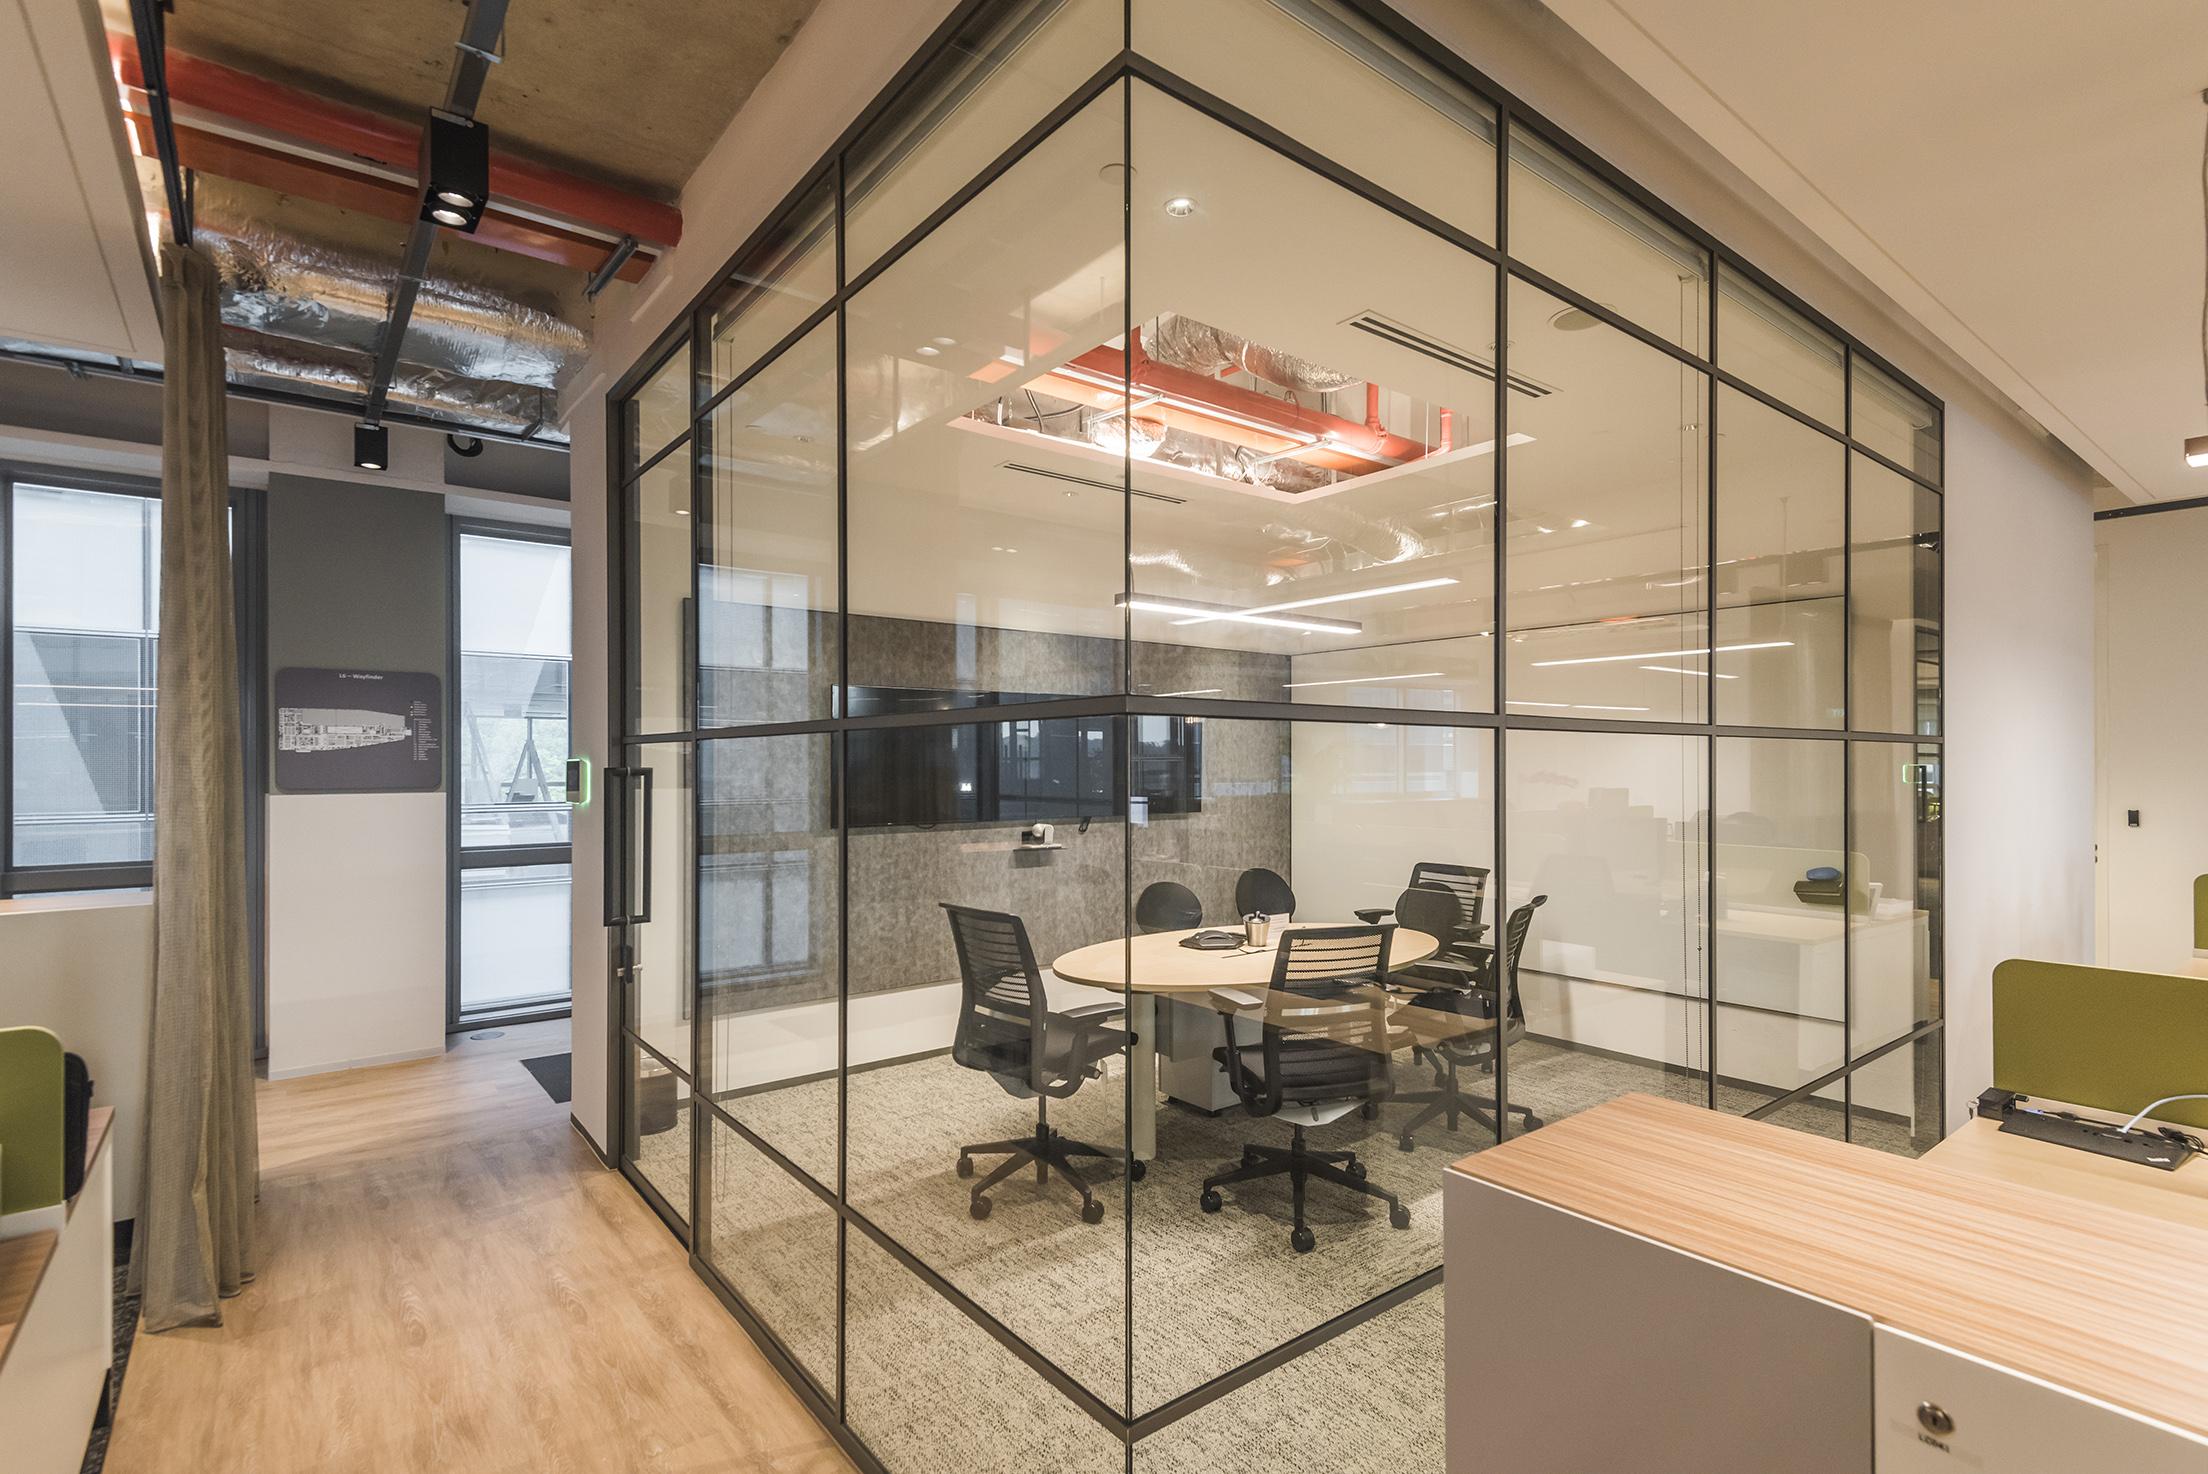 JEB-partitions-summit-integra-circa ia-Marriott-singapore-workspace-06.jpg